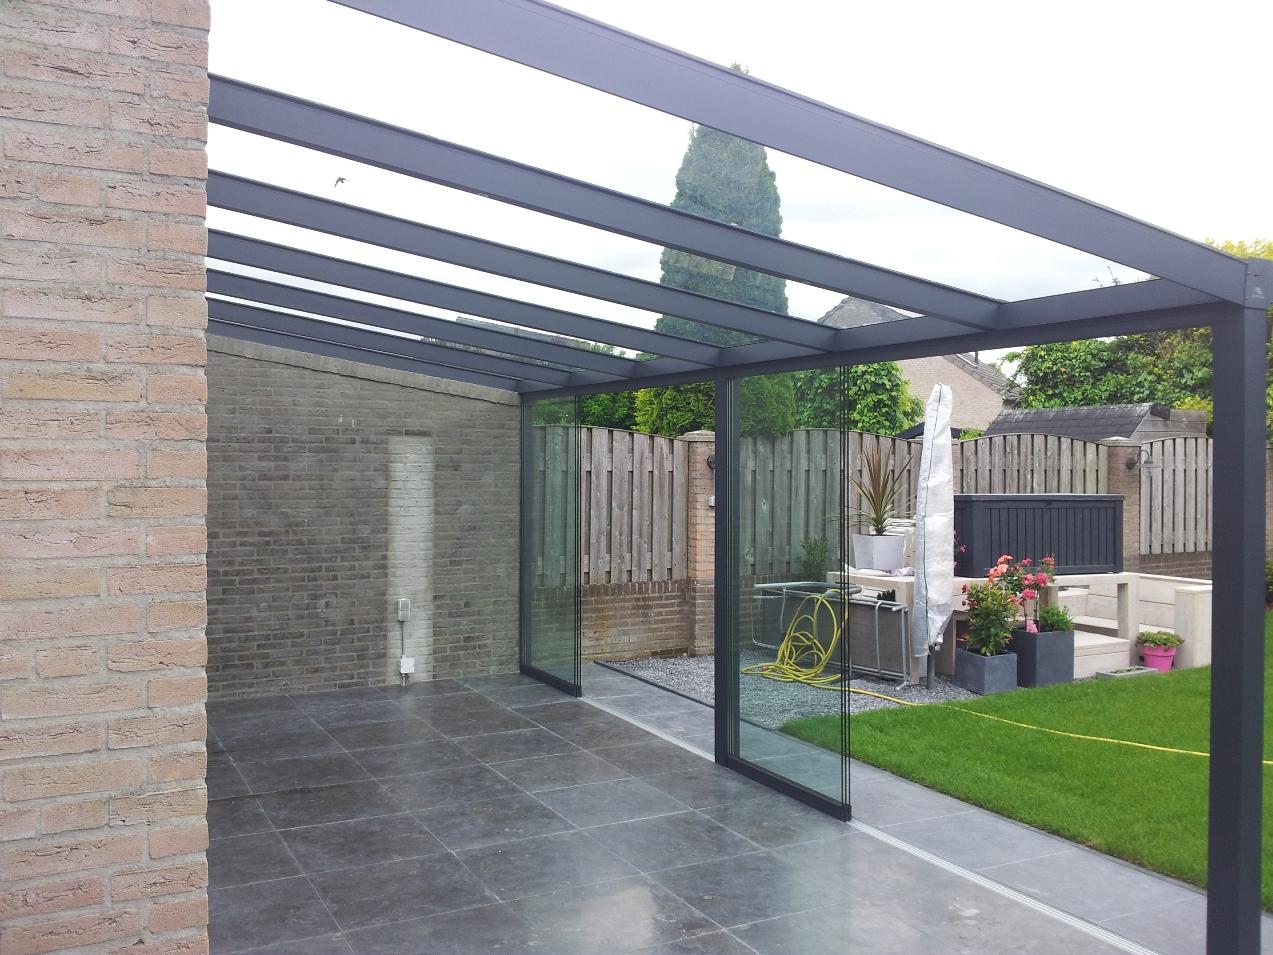 Alu reh glas schuifwand luxe for Terras modern huis